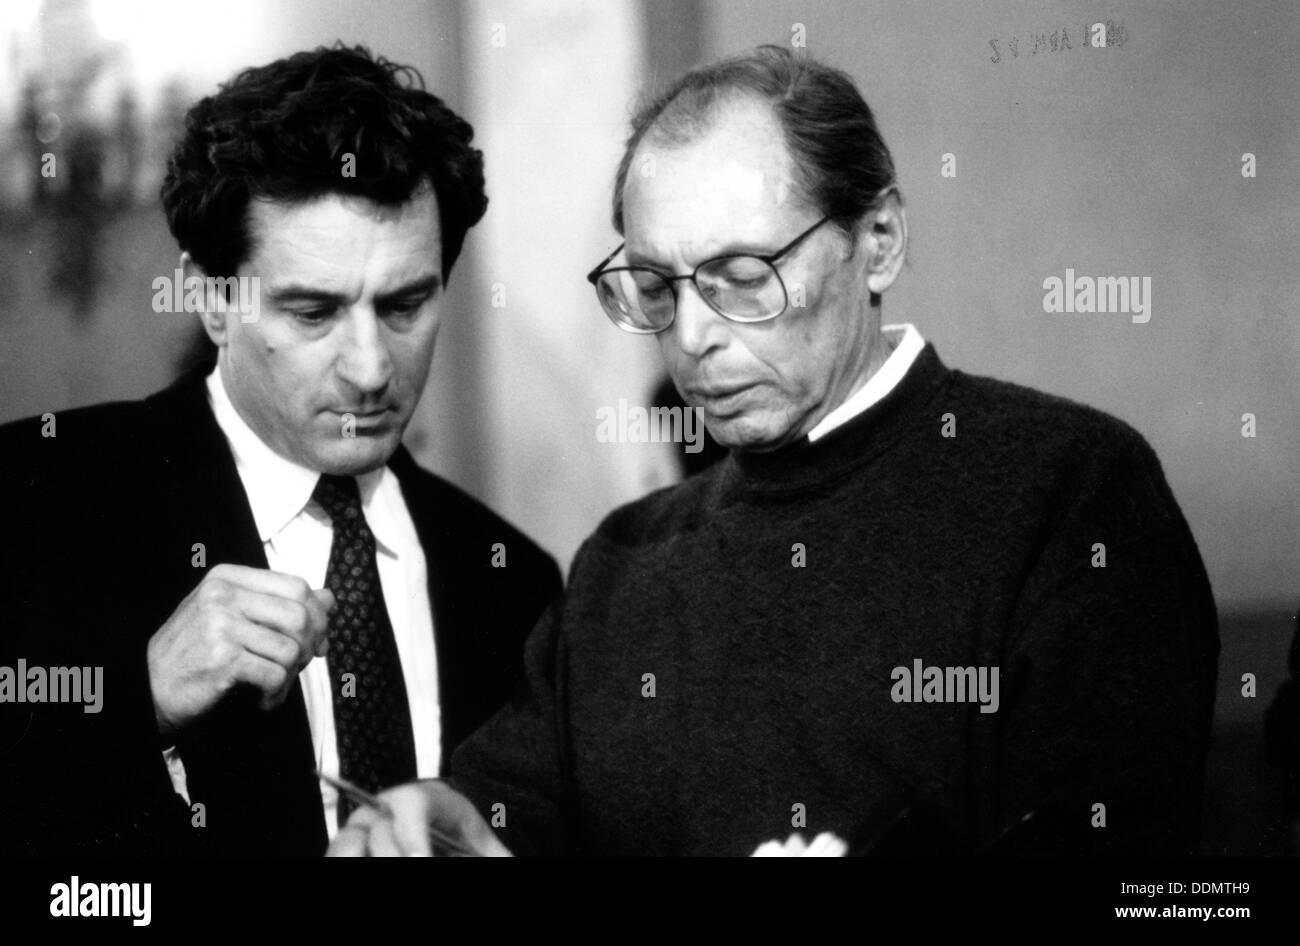 Irvin Winkler (1931- ) Film maker with Robert De Niro (1943- ), 1991. - Stock Image